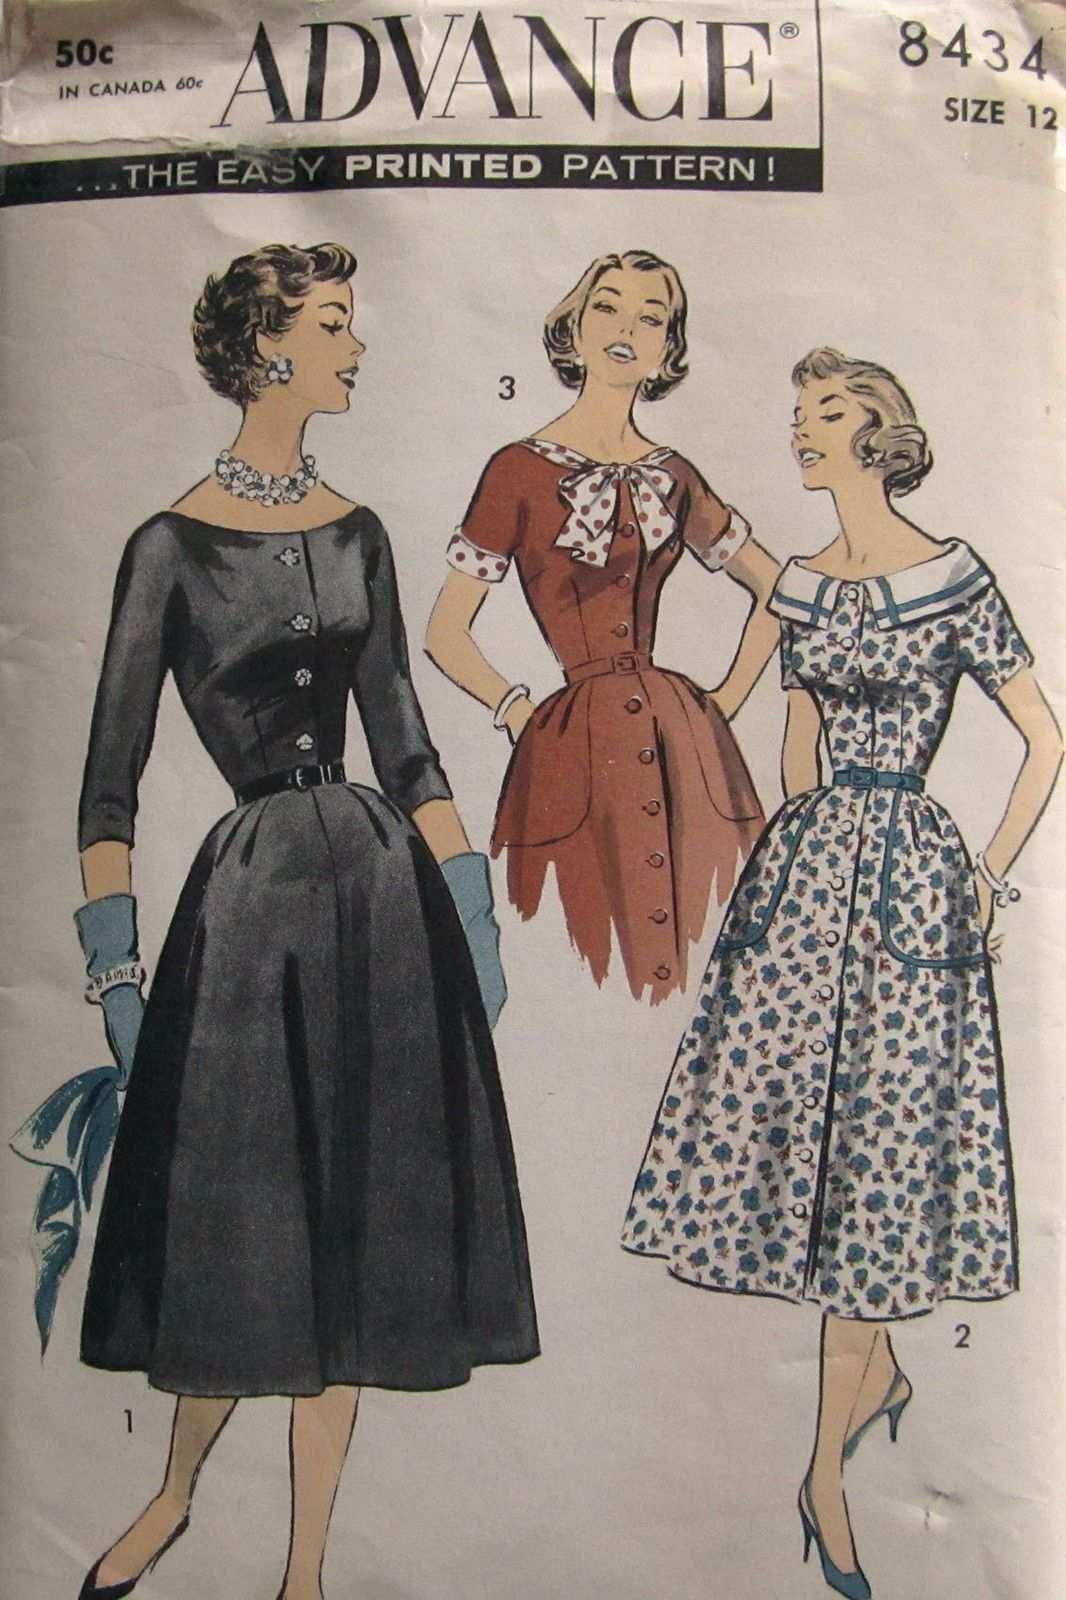 Advance 8434 1957 Schnittmuster Muster Schnittchen